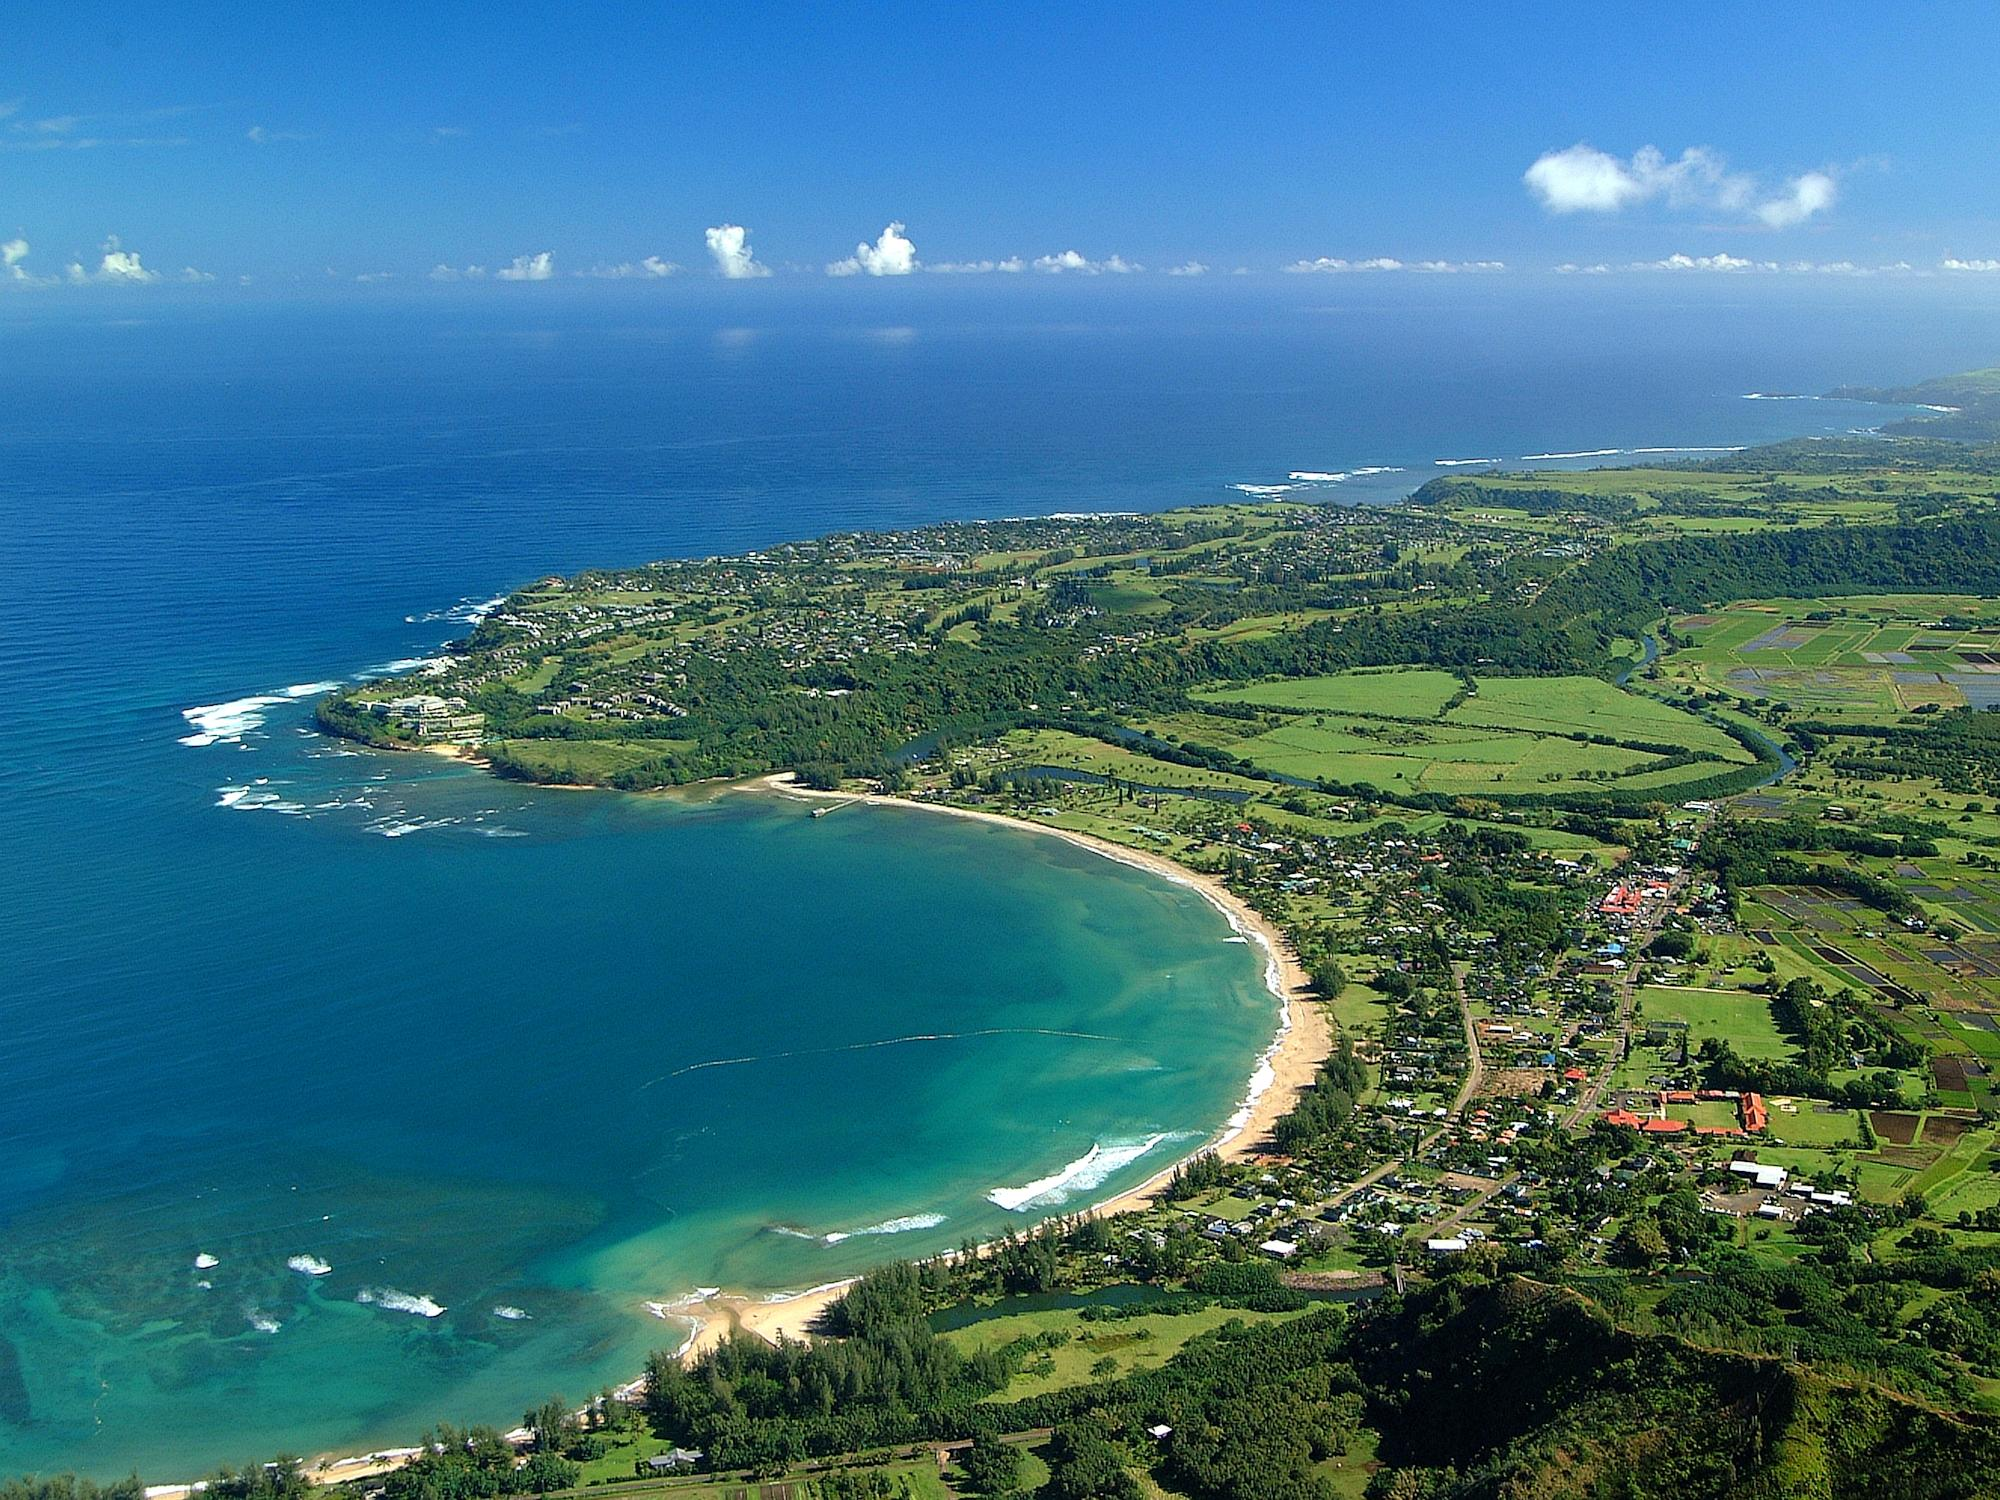 No. 4 Big Island, Hawaii | The World's Most Irresistible